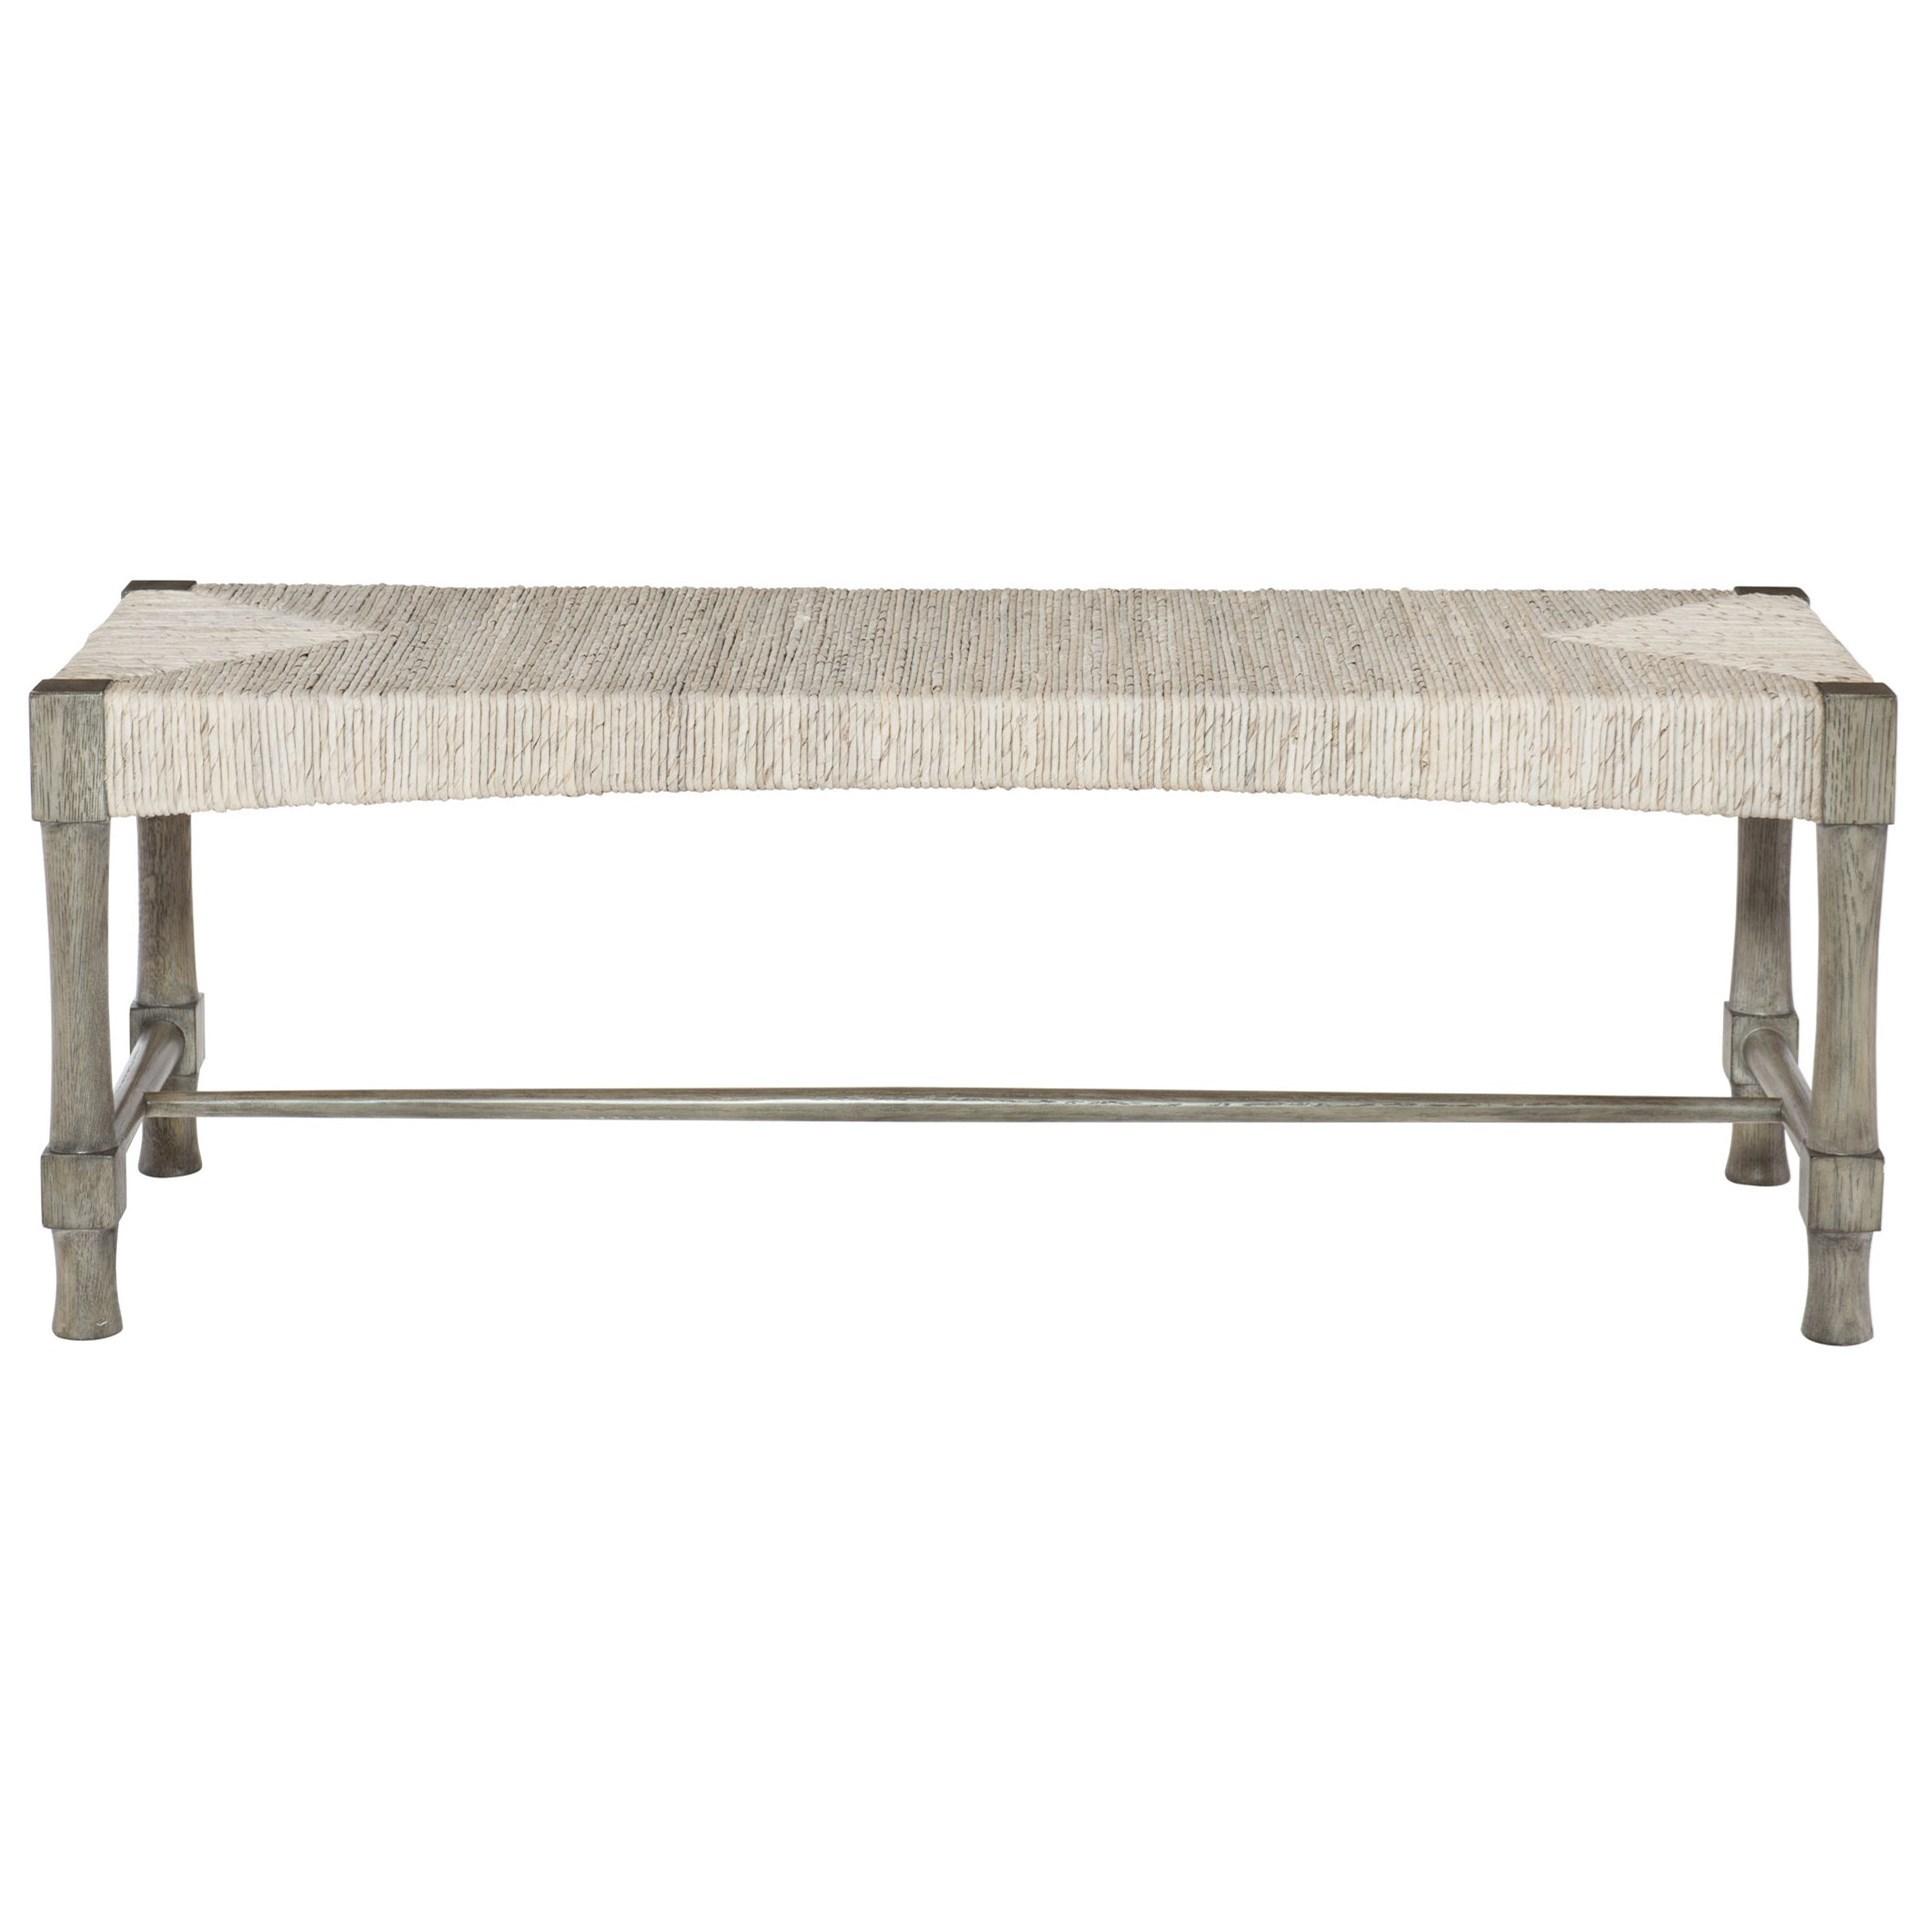 Bernhardt Palma 369 508 Woven Abaca Bed Bench Dunk